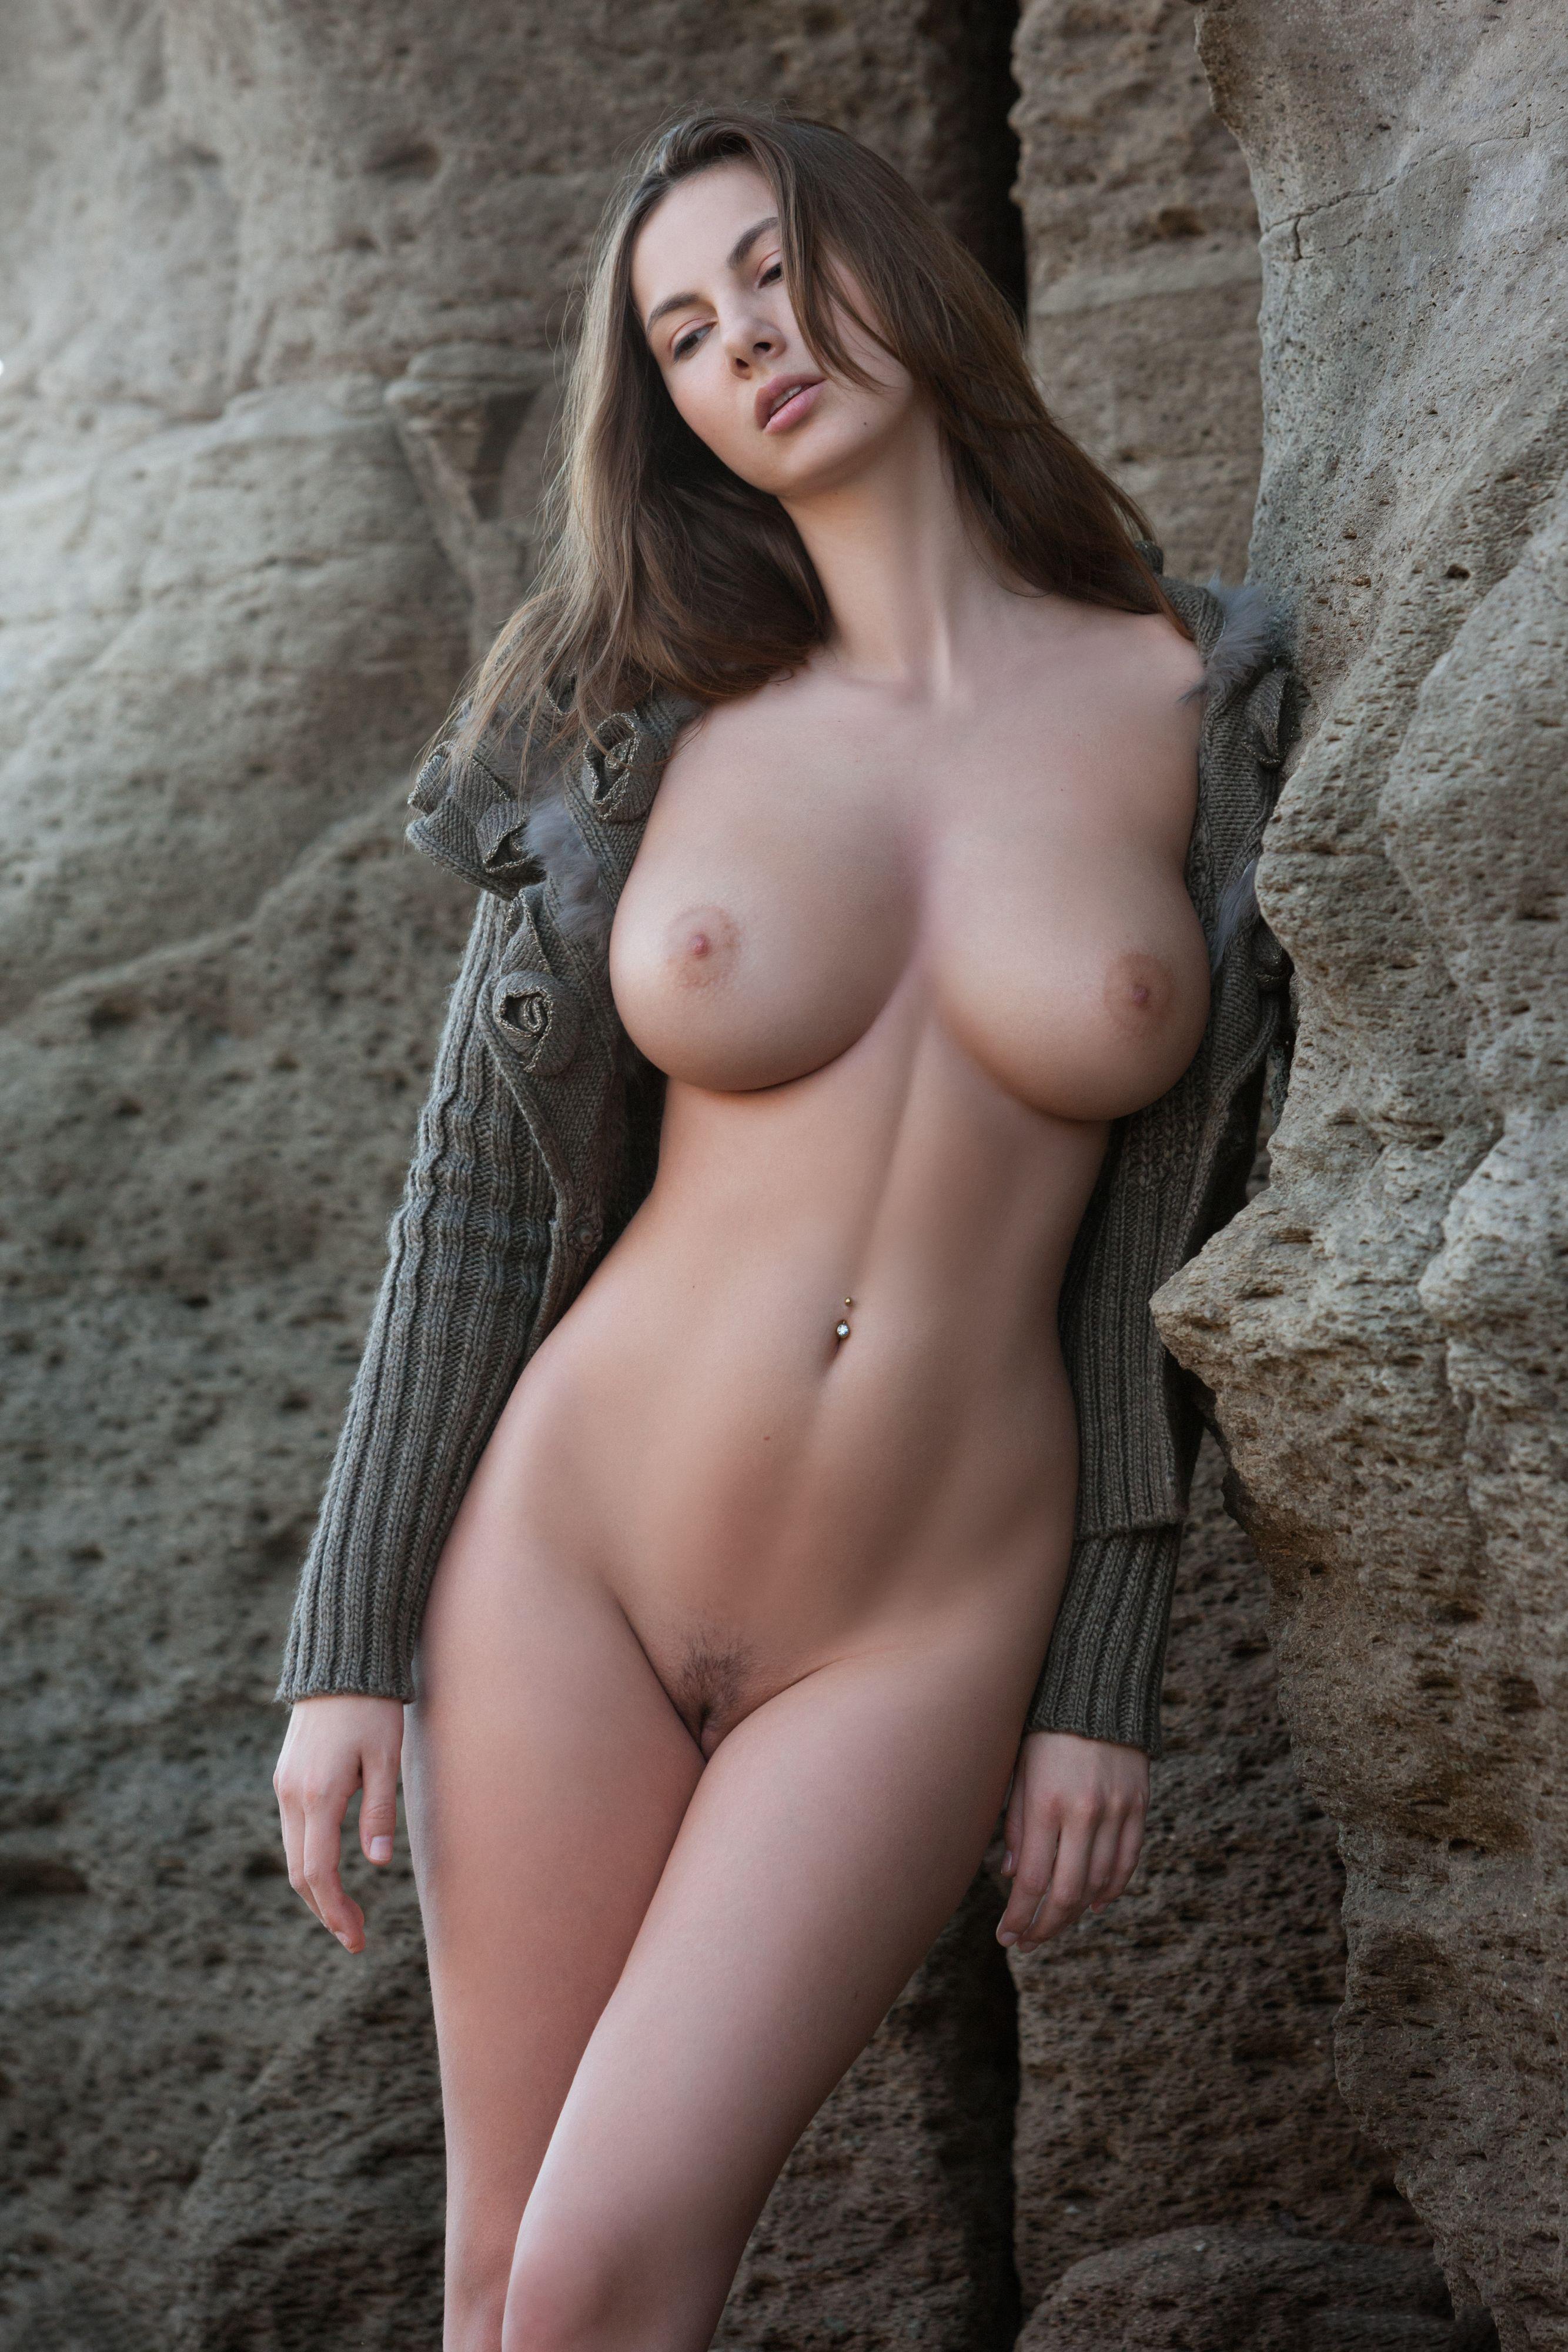 huge-boobs-tits-naked-mix-vol5-21